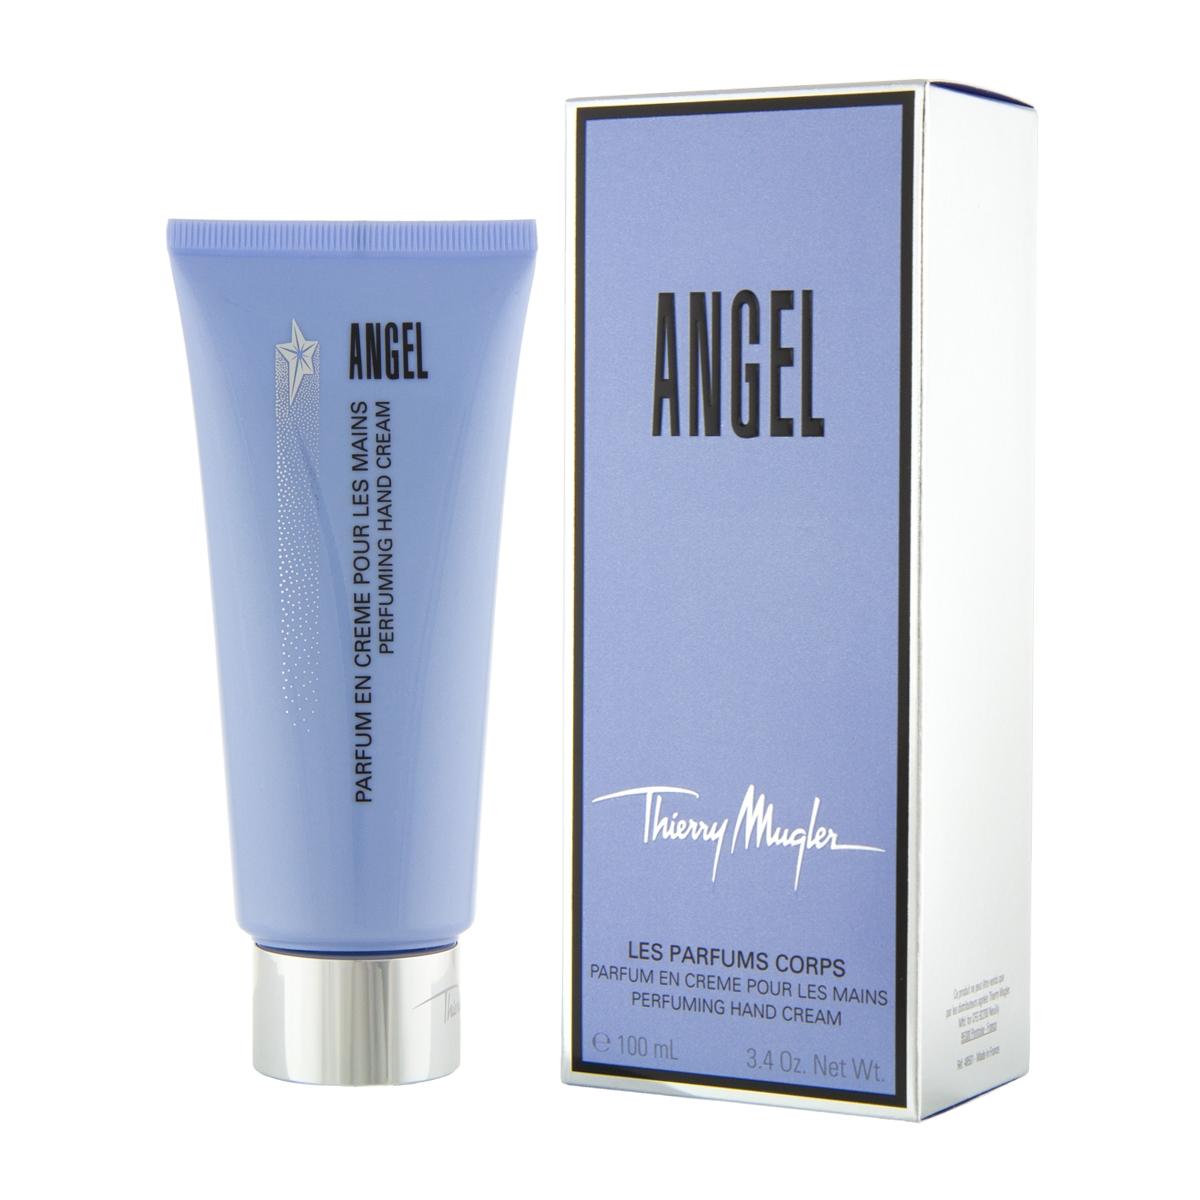 Thierry Mugler Angel krém na ruce 100 ml W